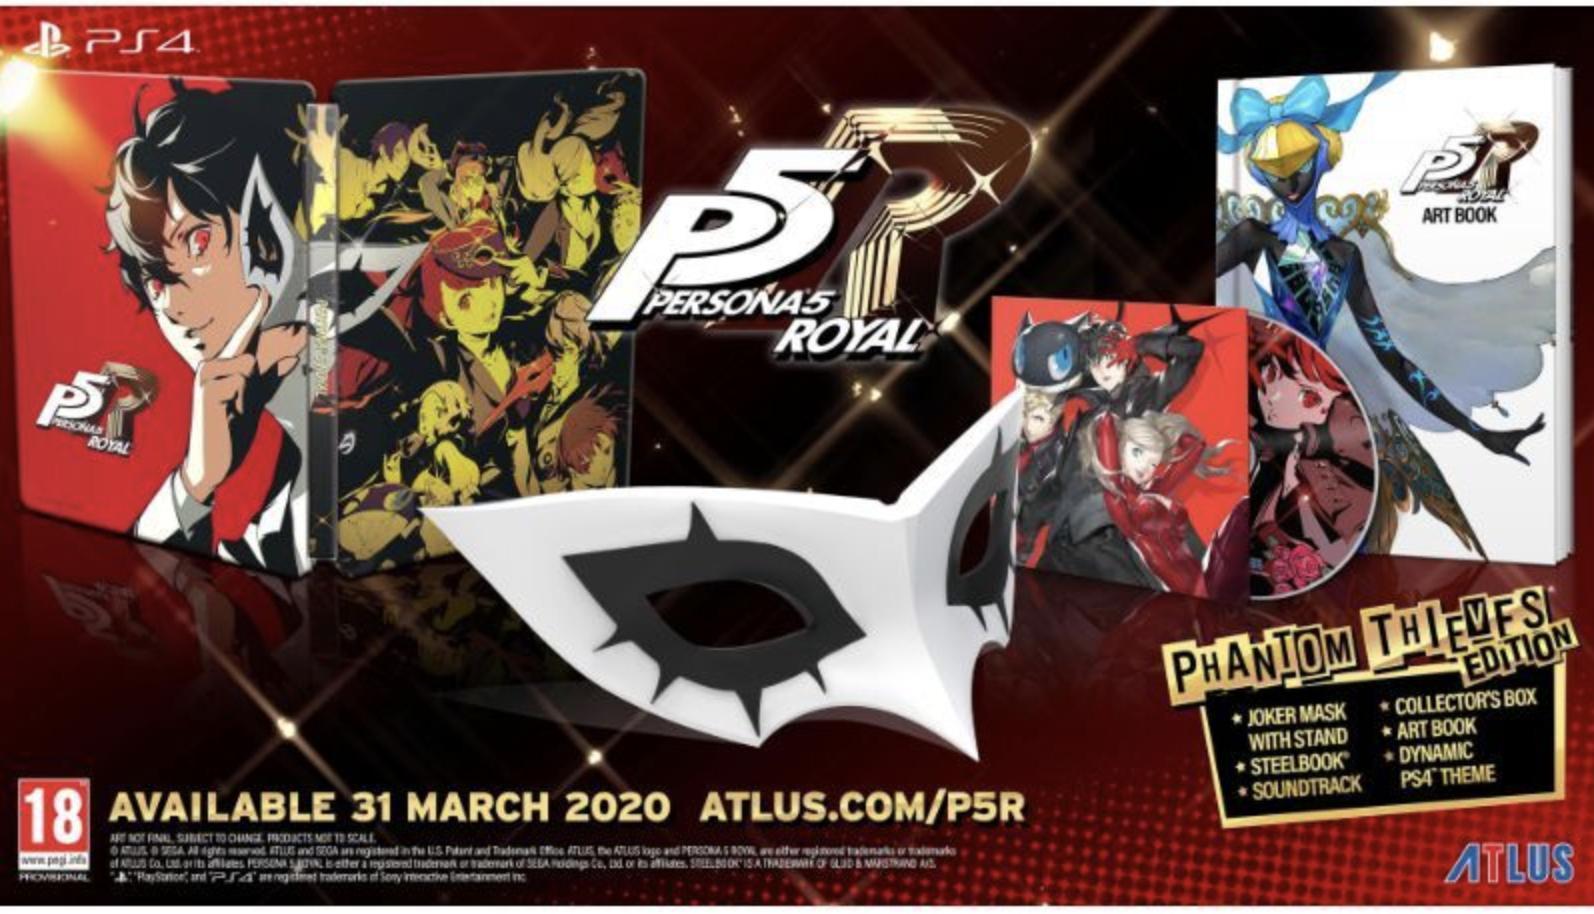 [PS4] Persona 5 Royal Phantom Thieves Edition £79.85 / Launch Edition £44.85 @ ShopTo